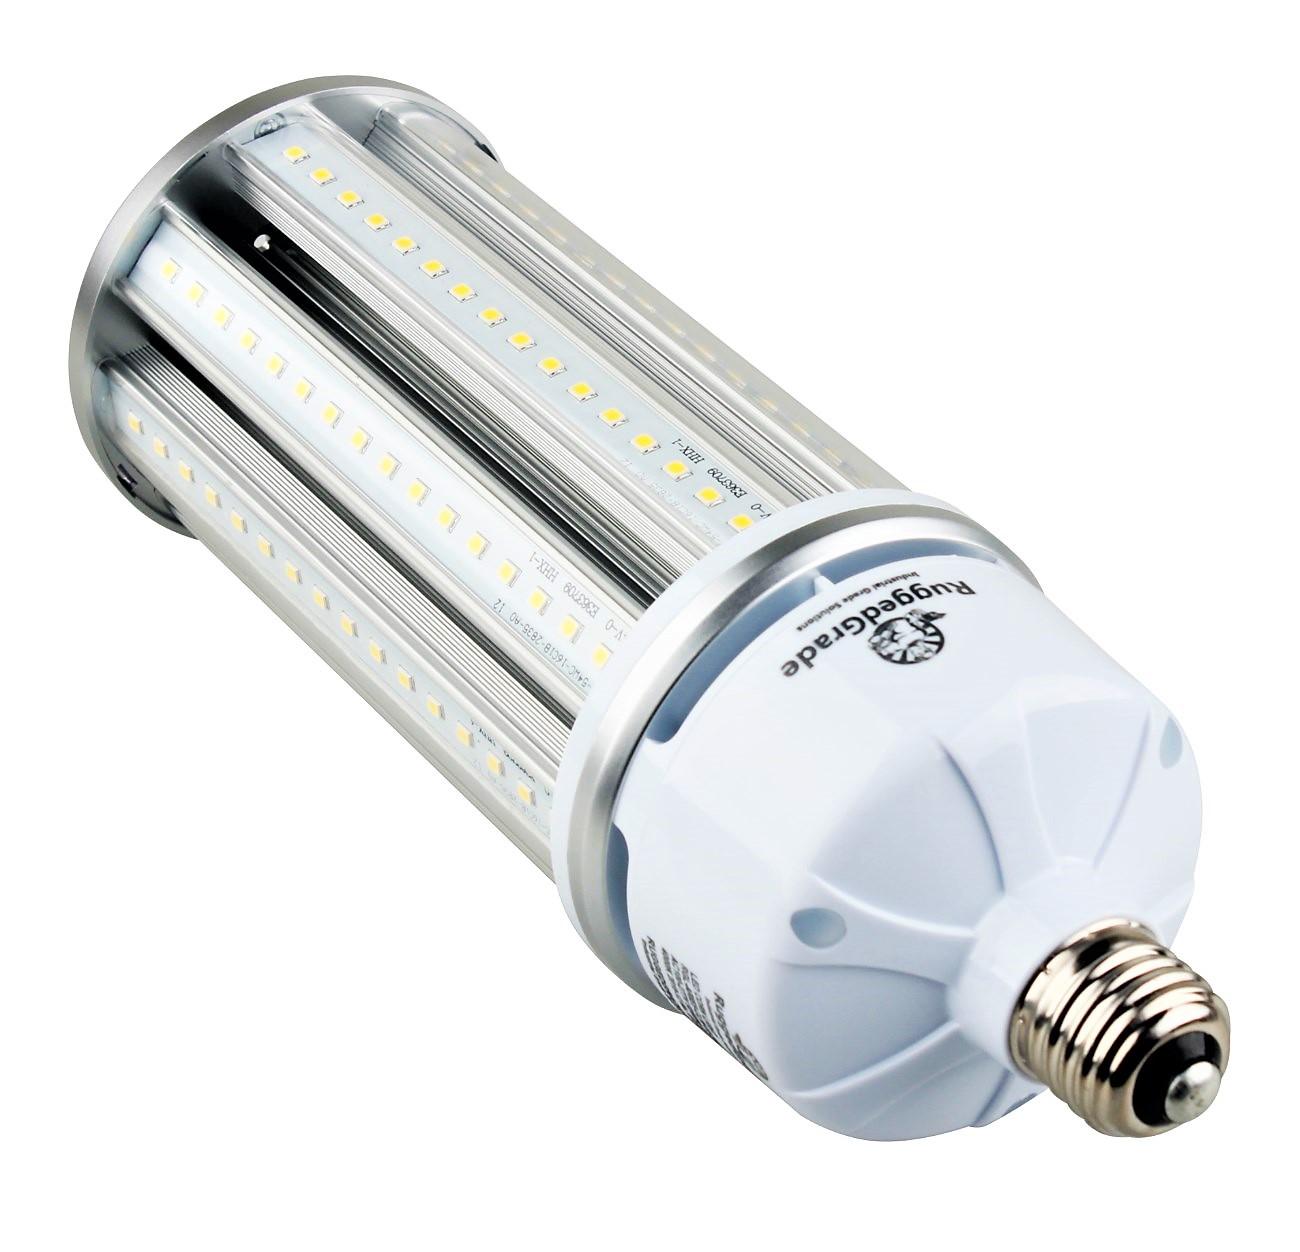 54 Watt Led Corn Light Bulb Standard E26 Base 7000